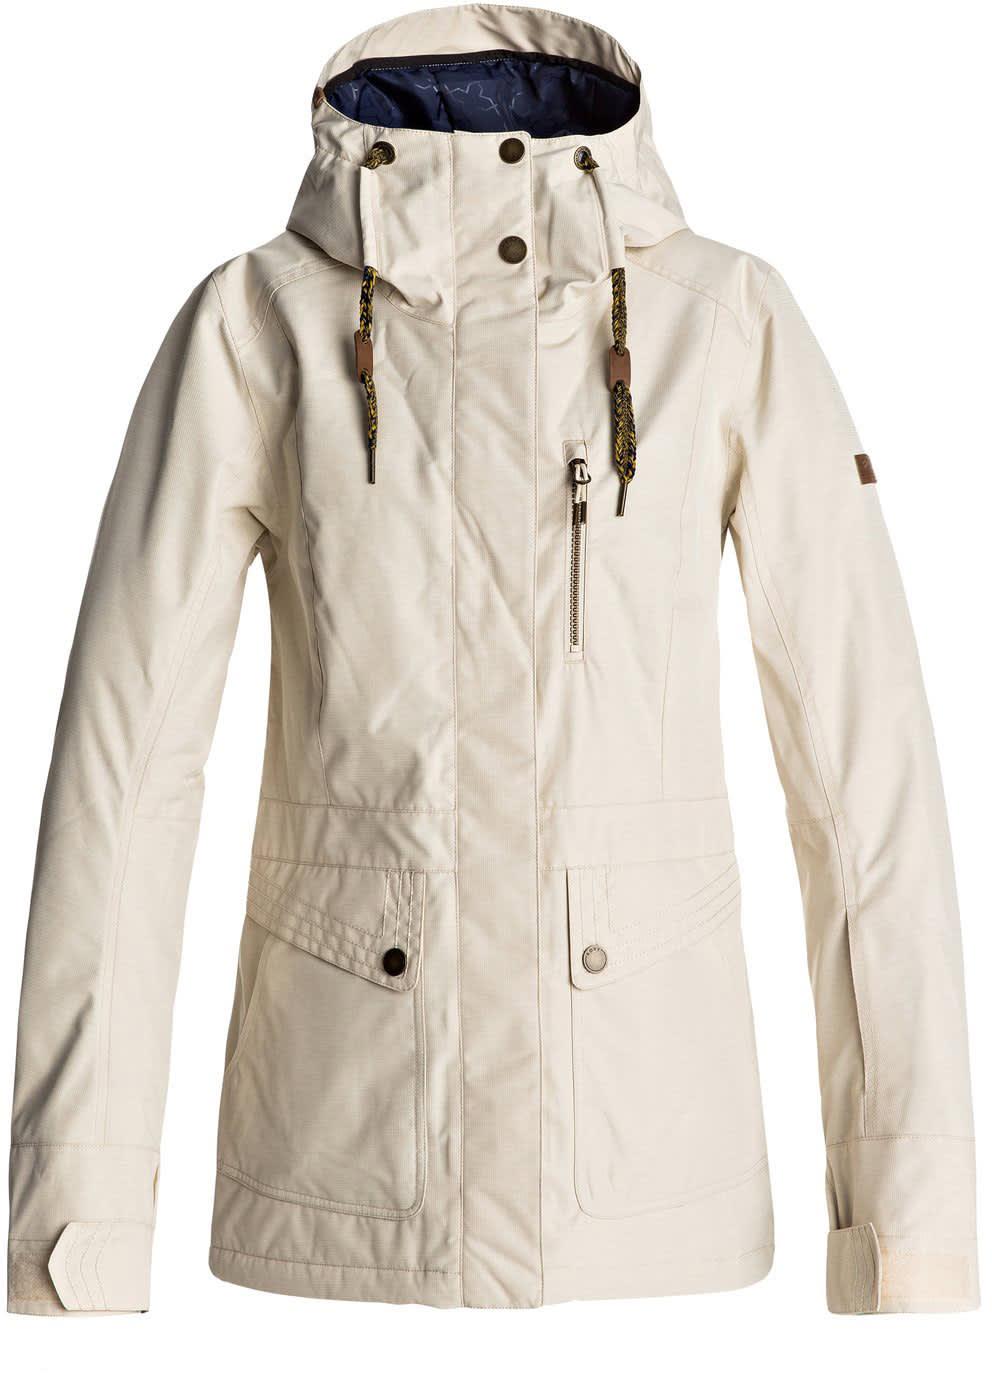 Insulated Jacket Women S